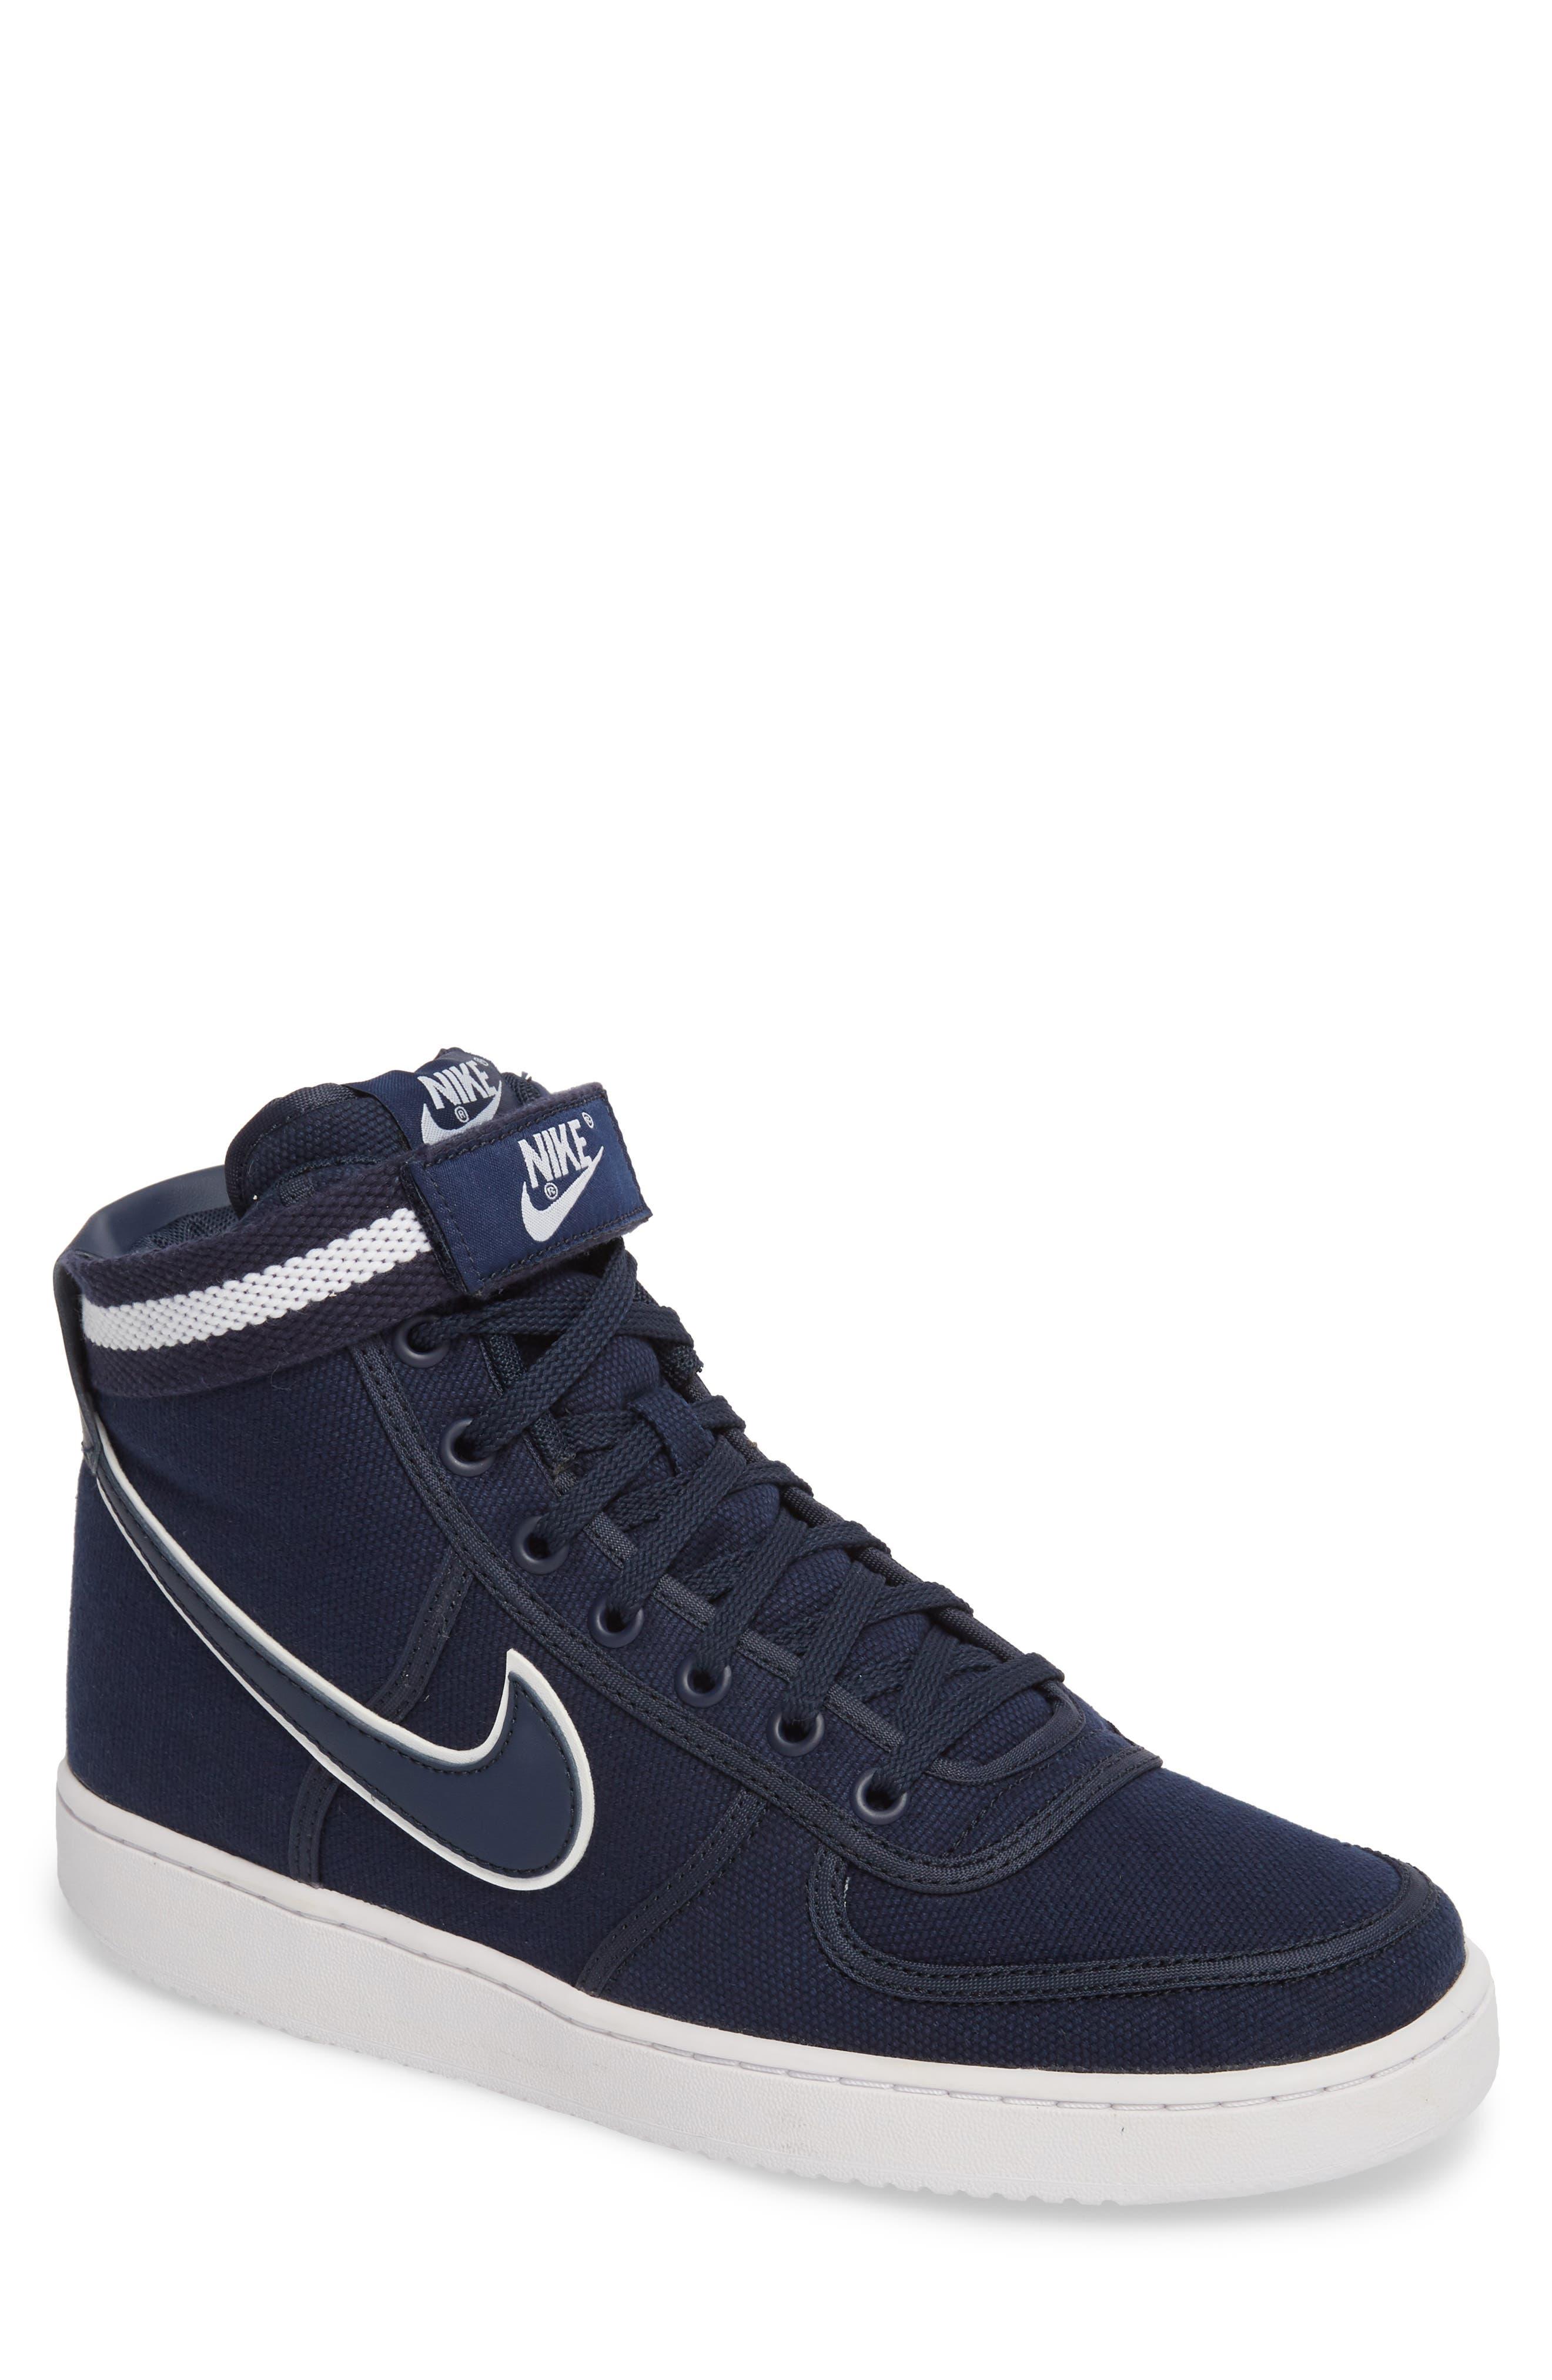 Vandal High Supreme High Top Sneaker,                         Main,                         color, Obsidian/ White